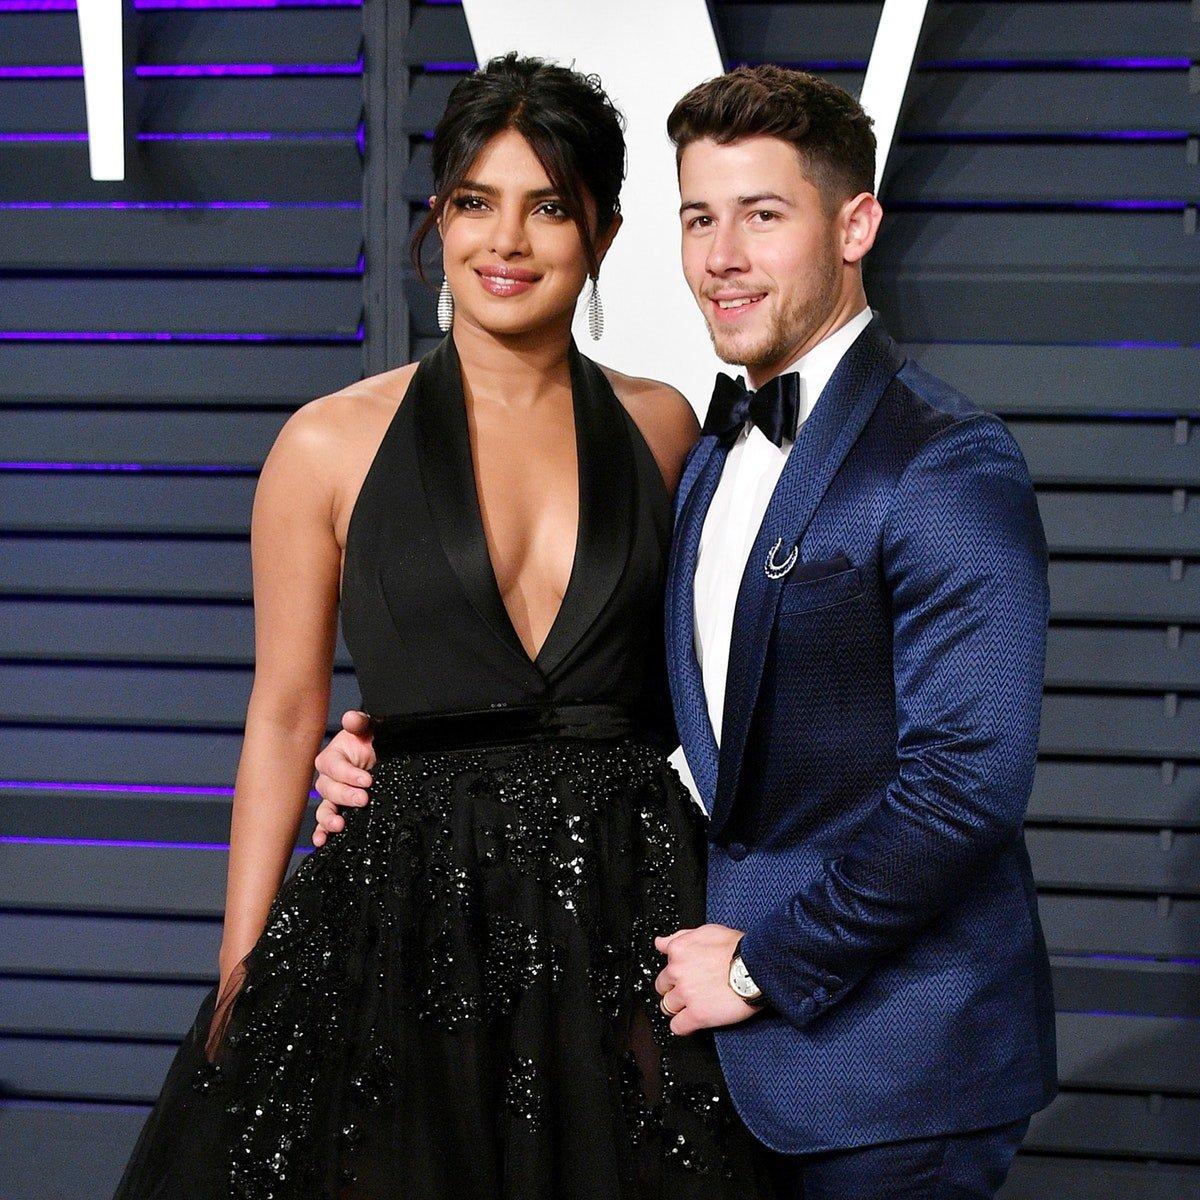 Priyanka Chopra & Nick Jonas Attending The VF Oscars Party Holds Some Sweet Significance